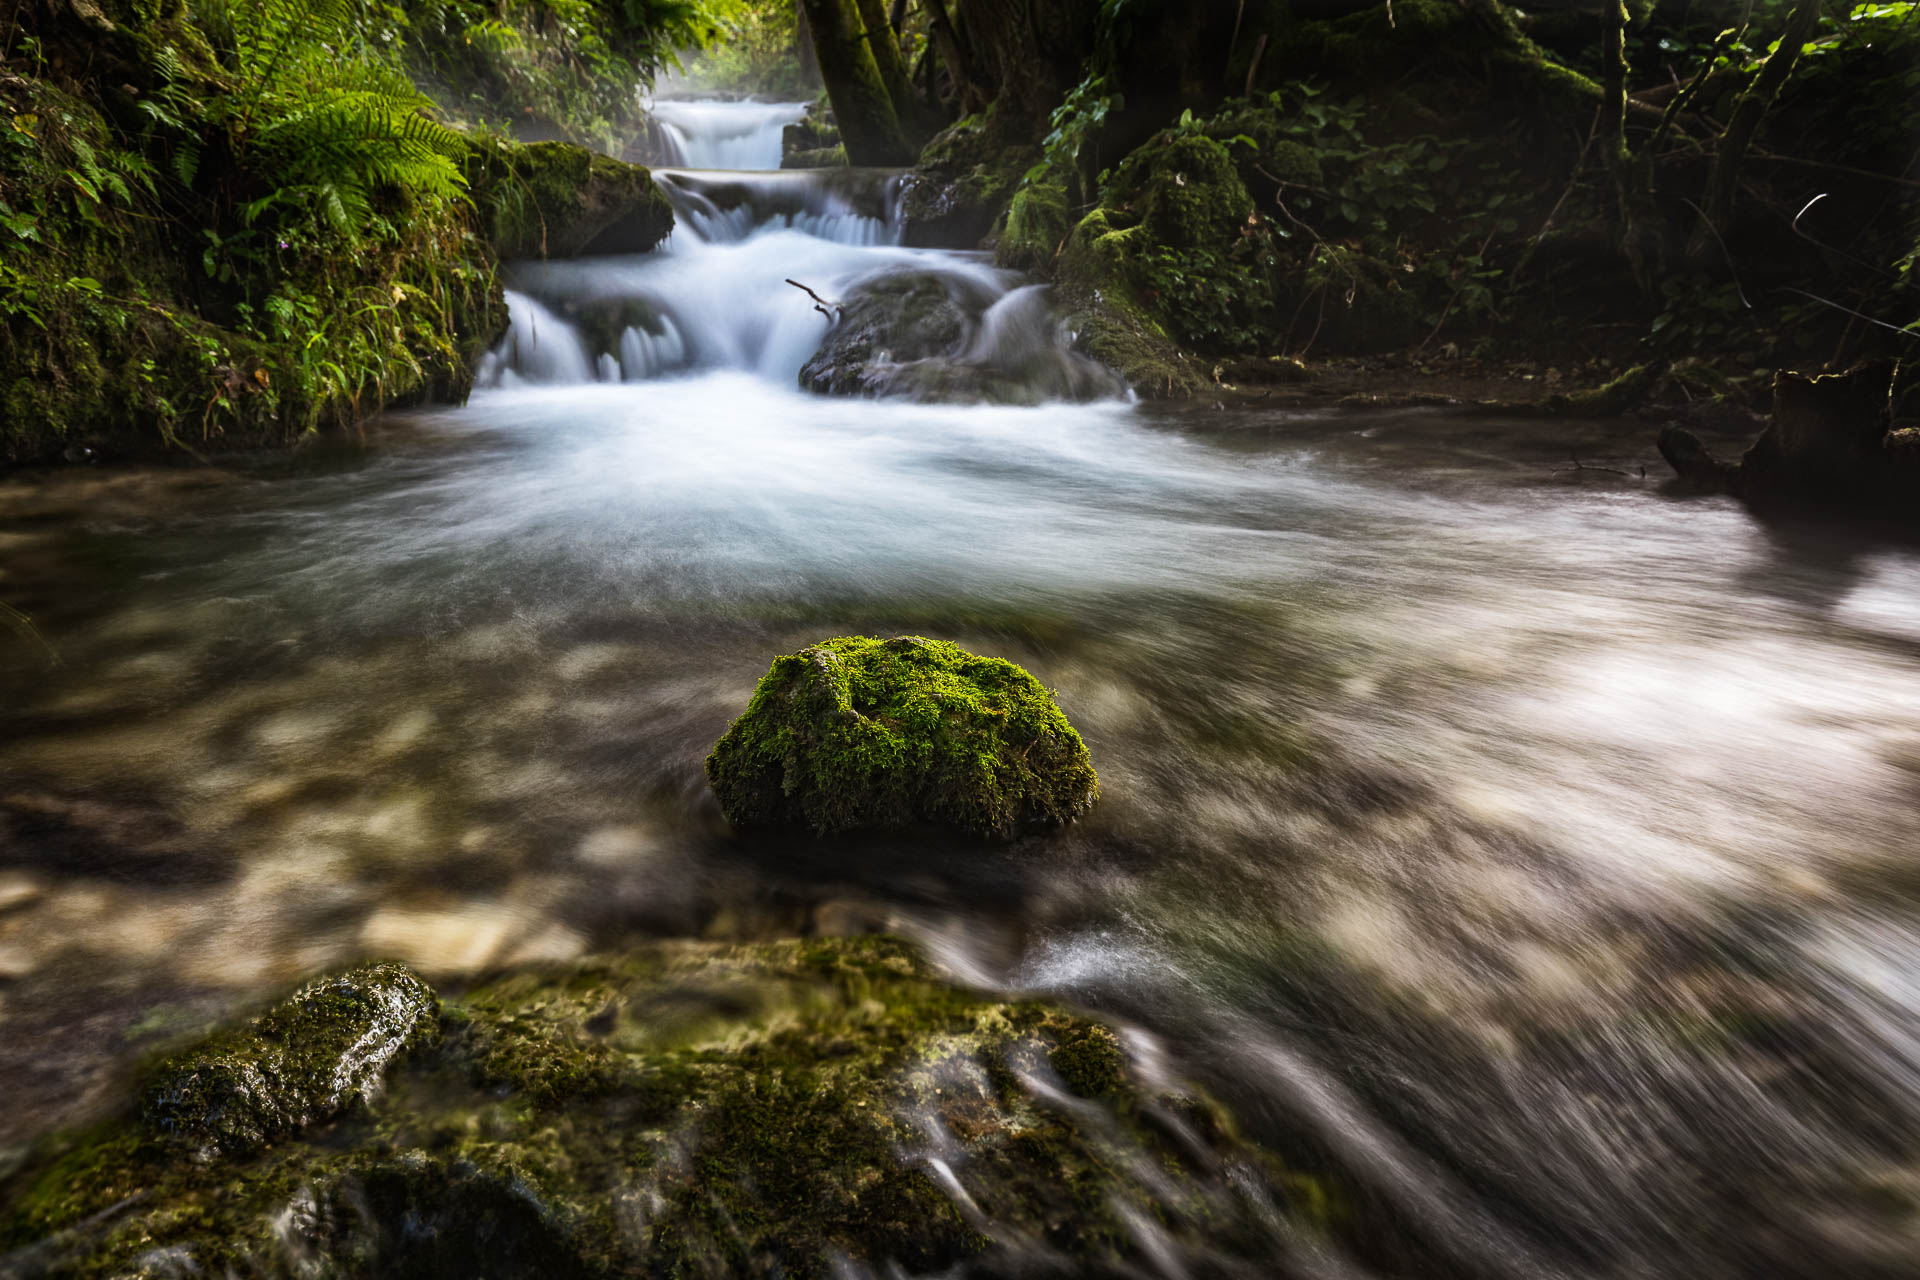 Bad Urach Bachlauf am Weg zum Wasserfall